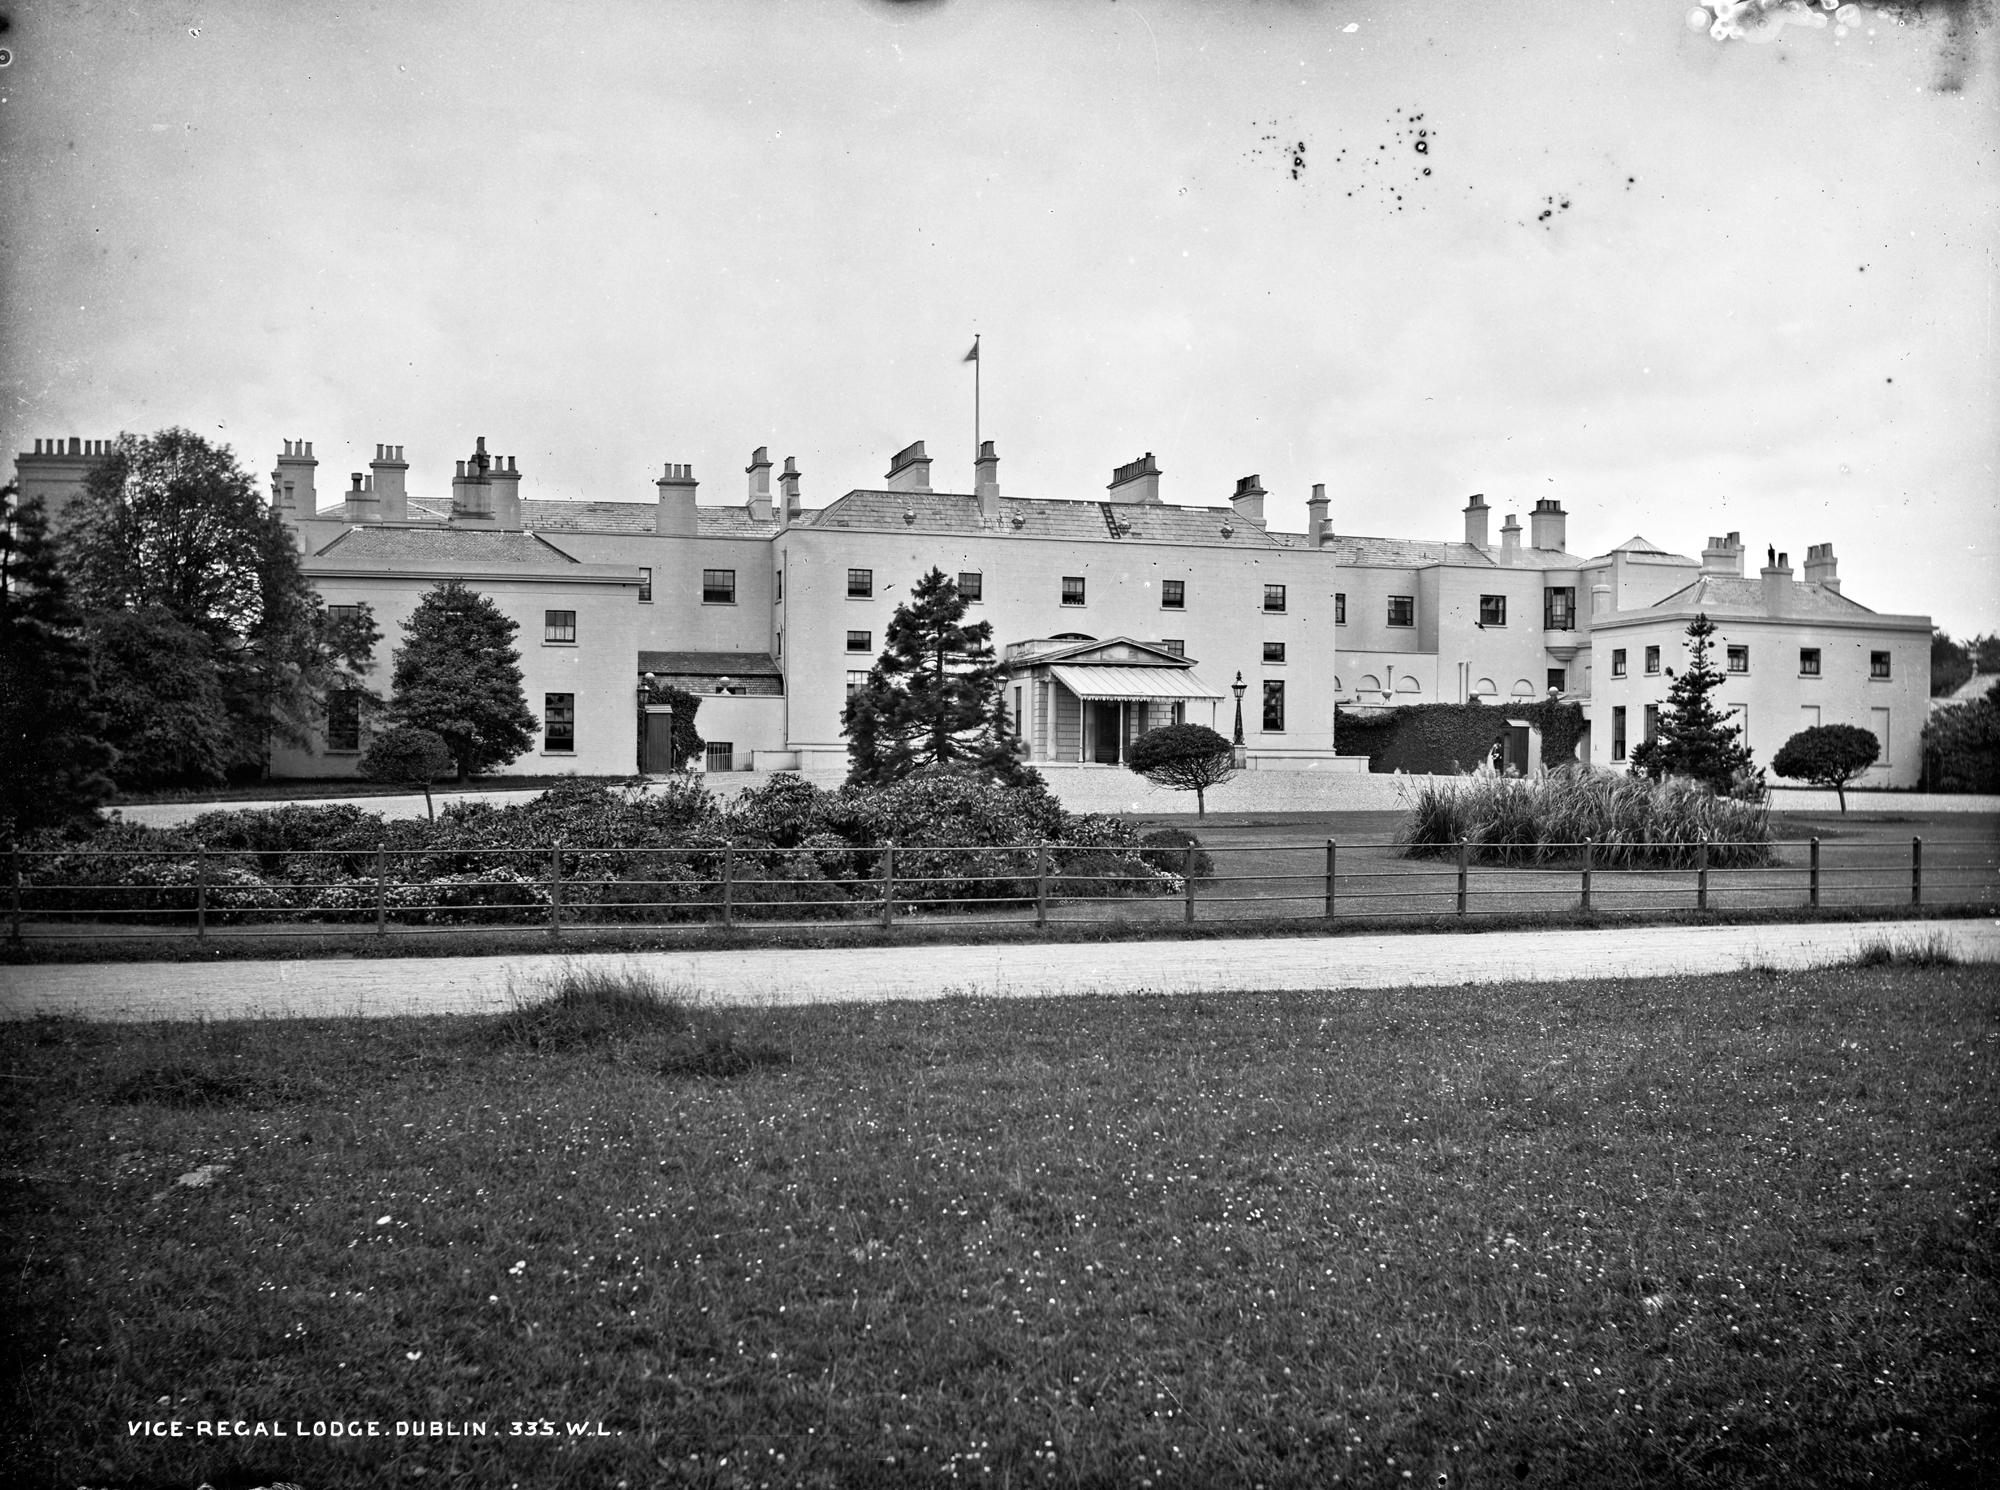 Vice-Regal Lodge, Dublin City, Co. Dublin